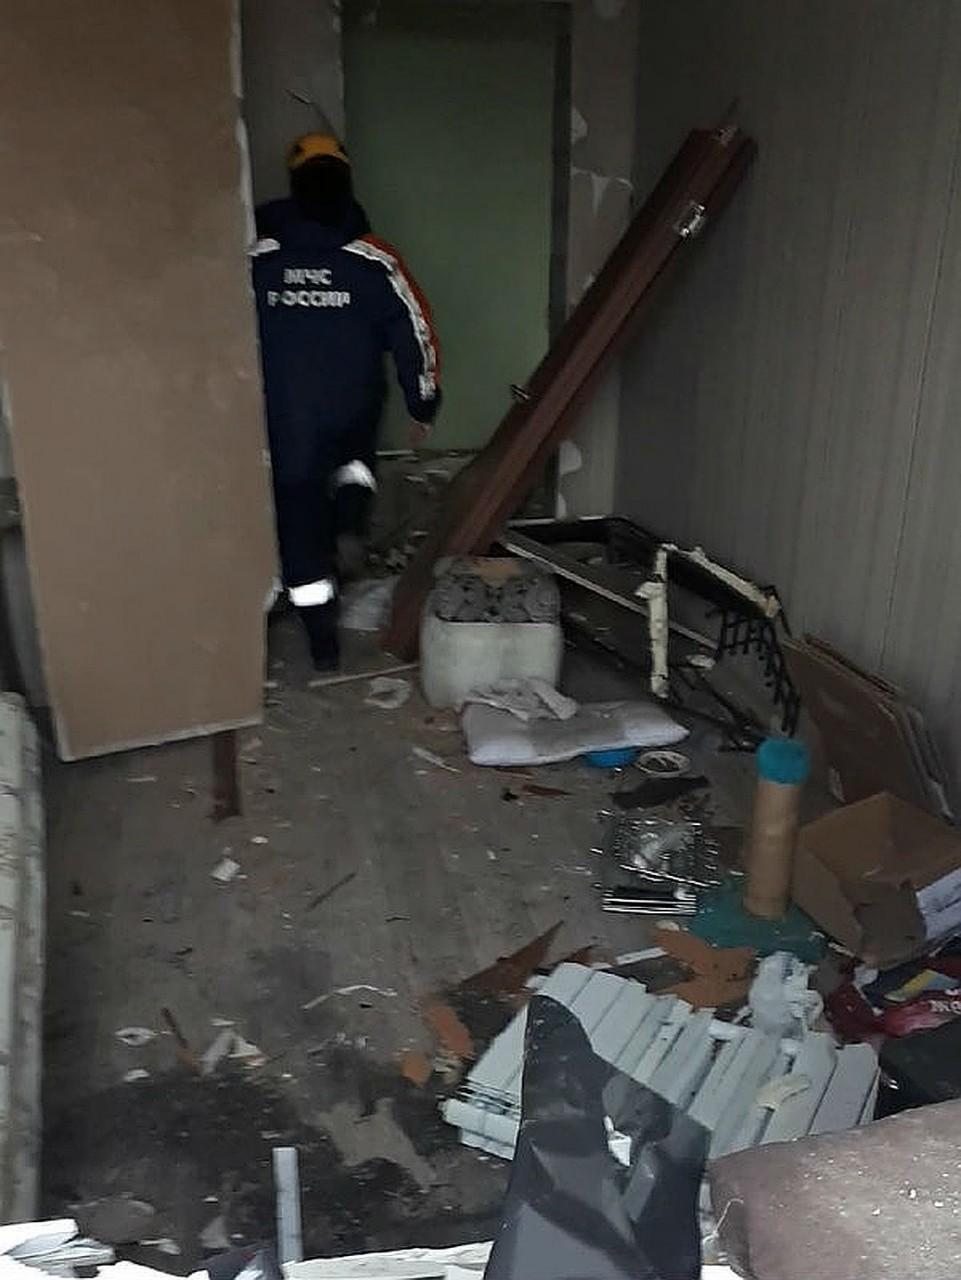 Комната Татьяны после взрыва. Фото: Татьяна КОТОВА.